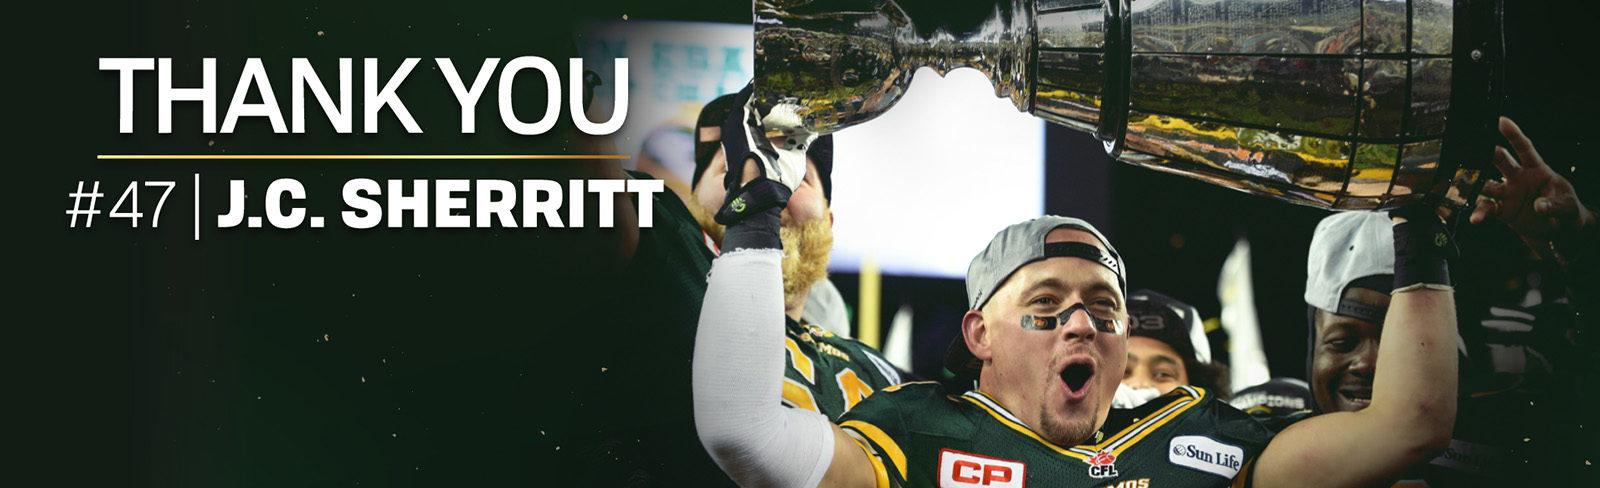 Eskimos J.C. Sherritt Retires From Professional Football - Edmonton Eskimos